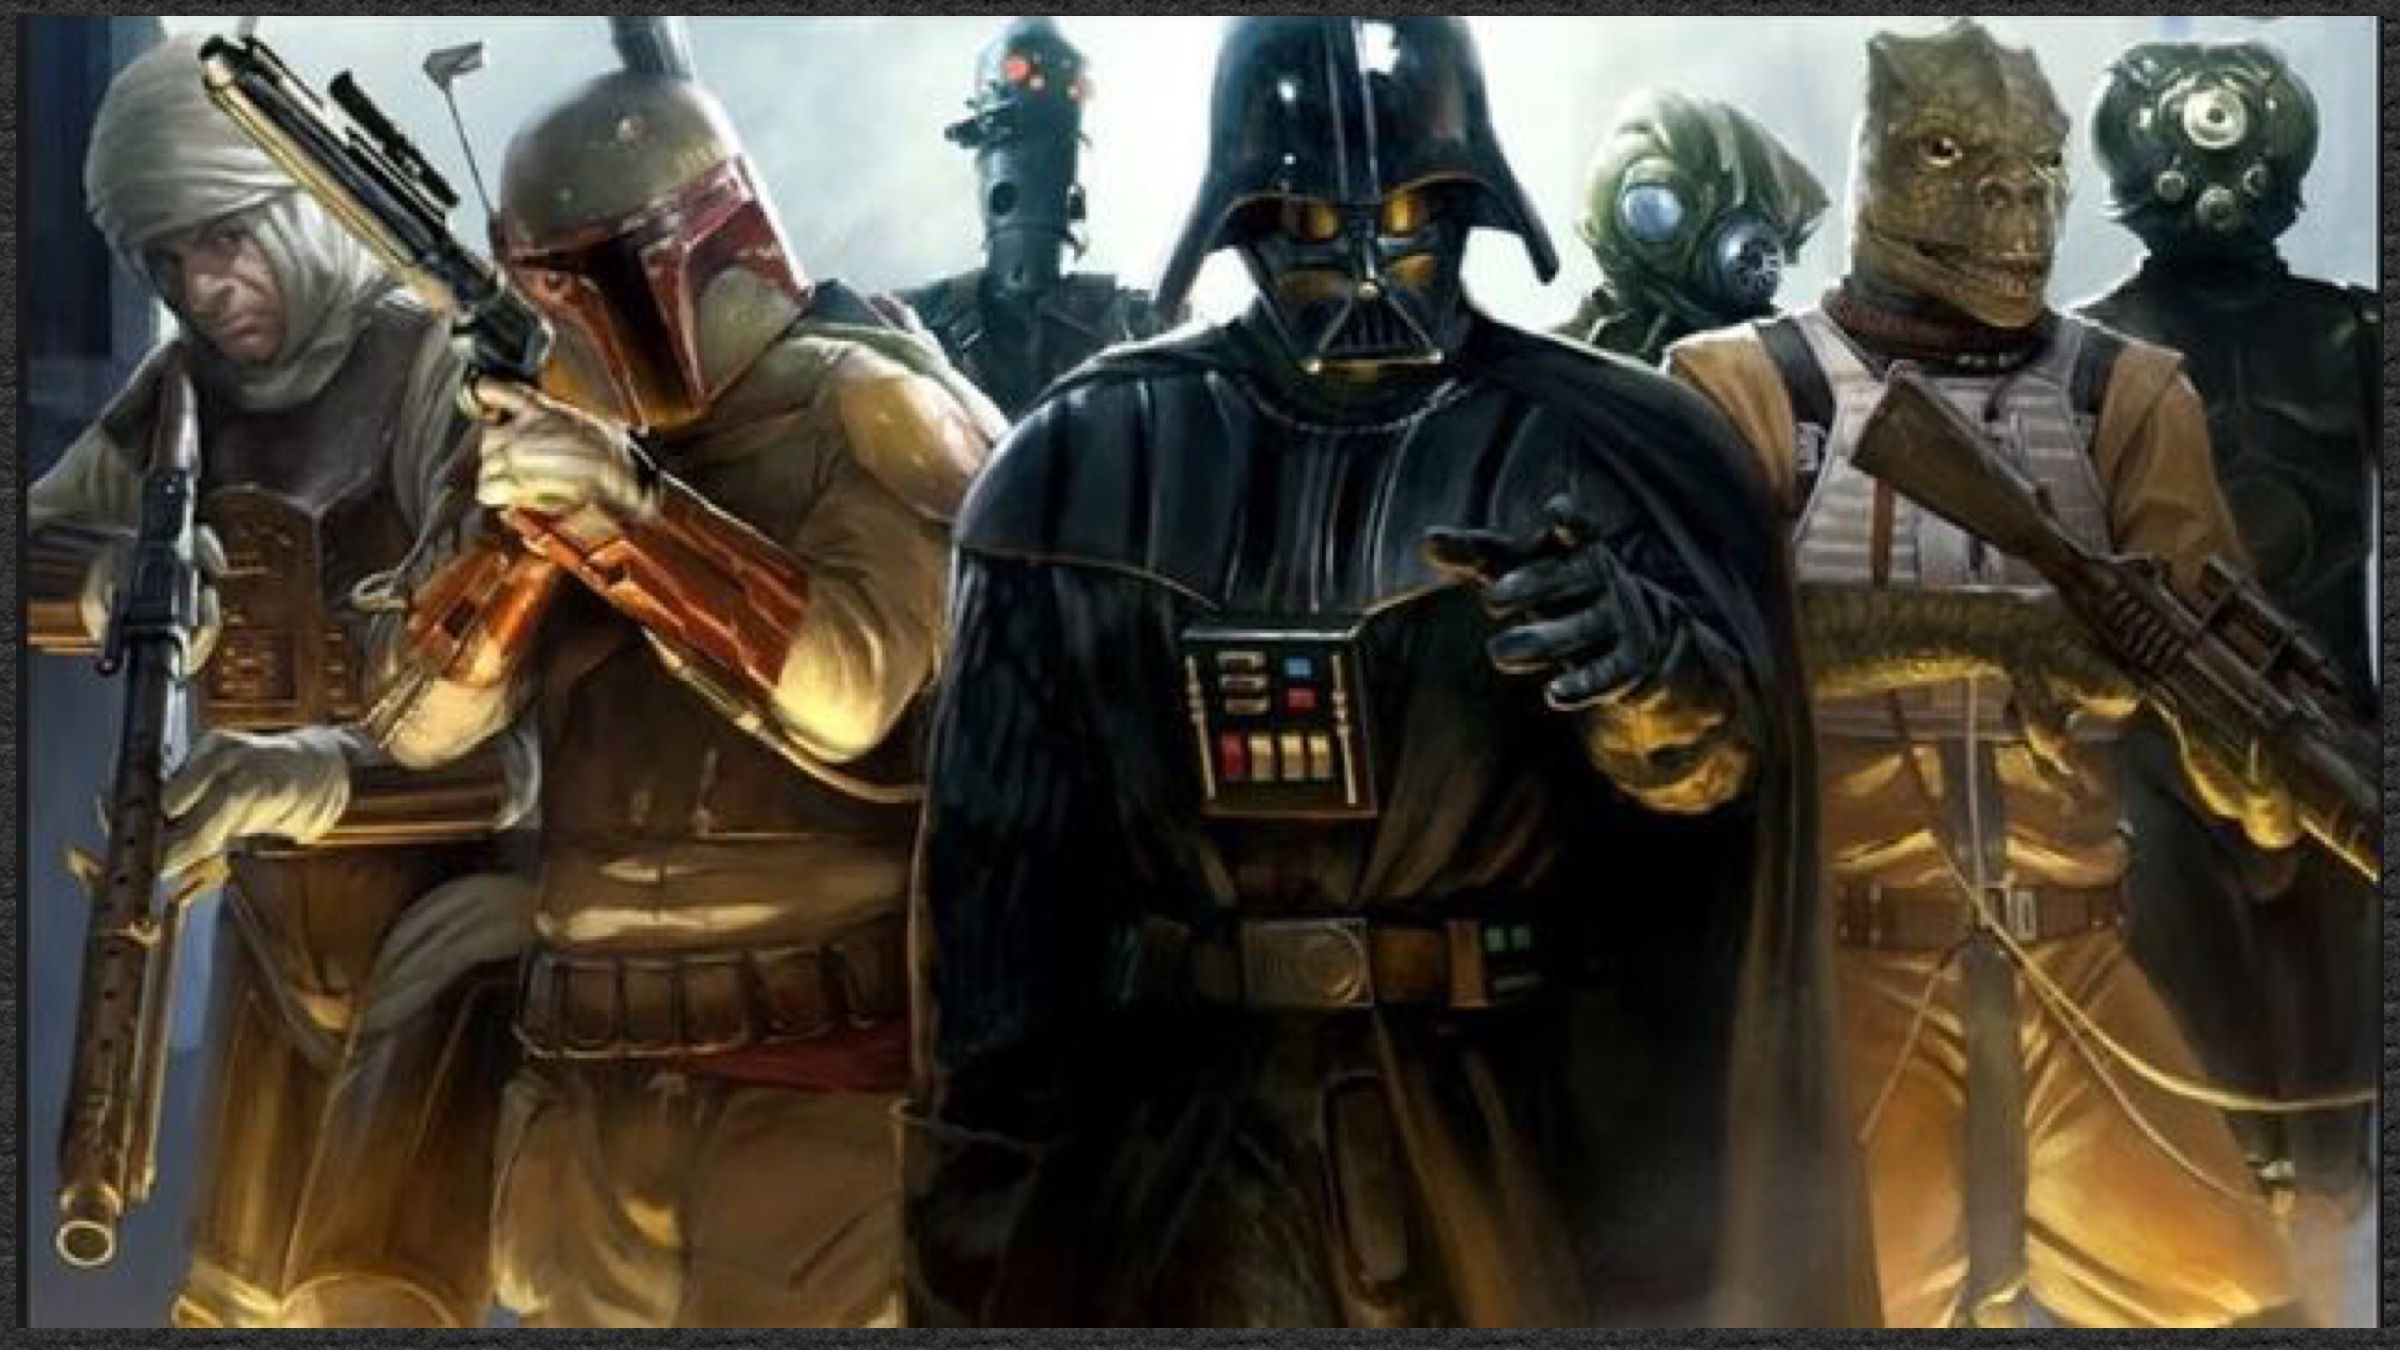 Star Wars Darth Vader And The Bounty Hunters Star Wars